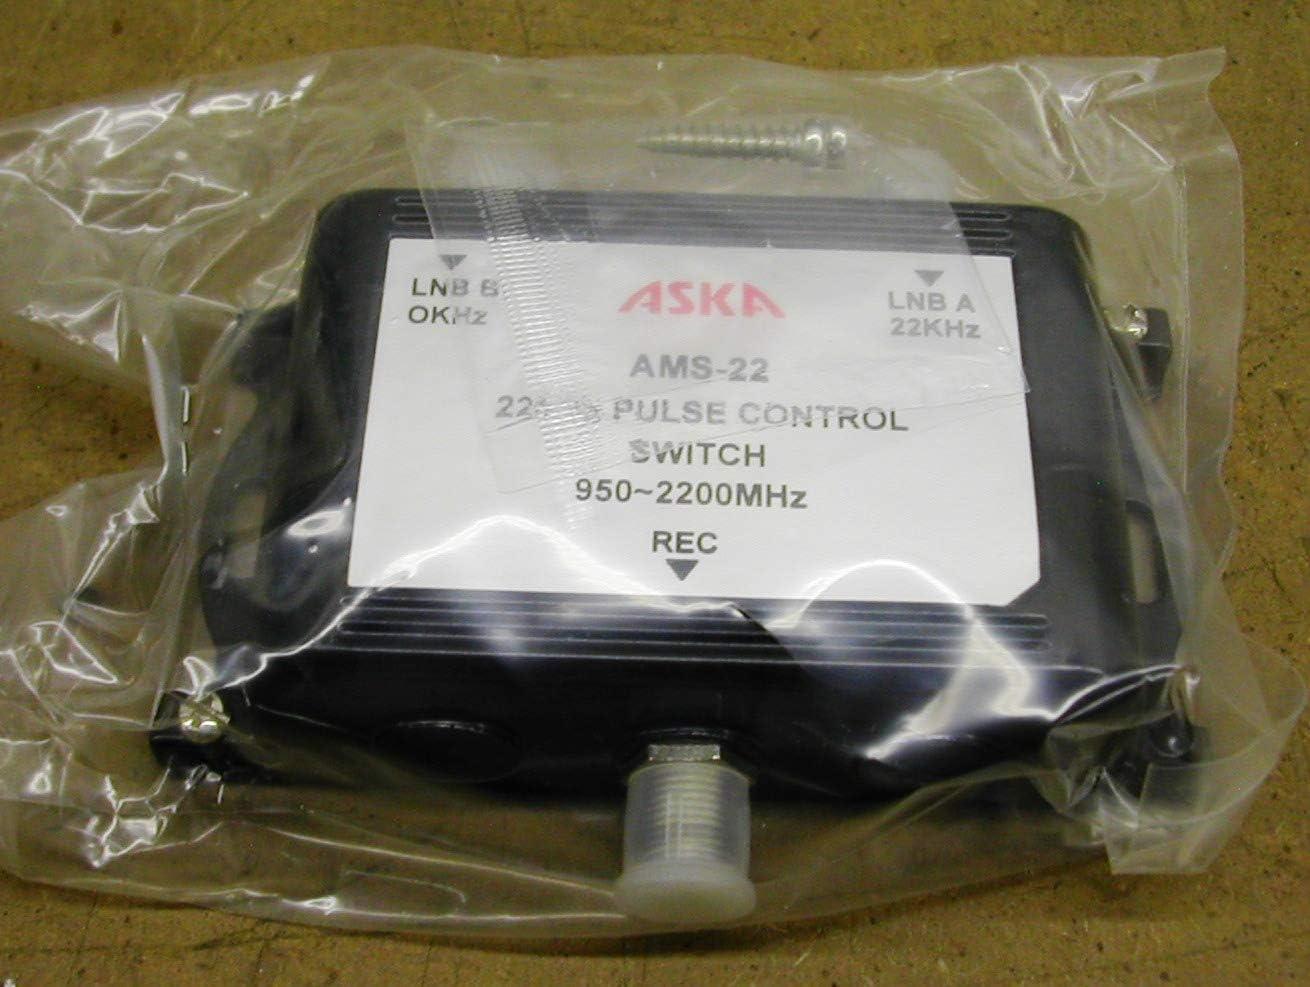 ASKA AMS-22 22KHz Pulse Control Switch 950-2200MHz